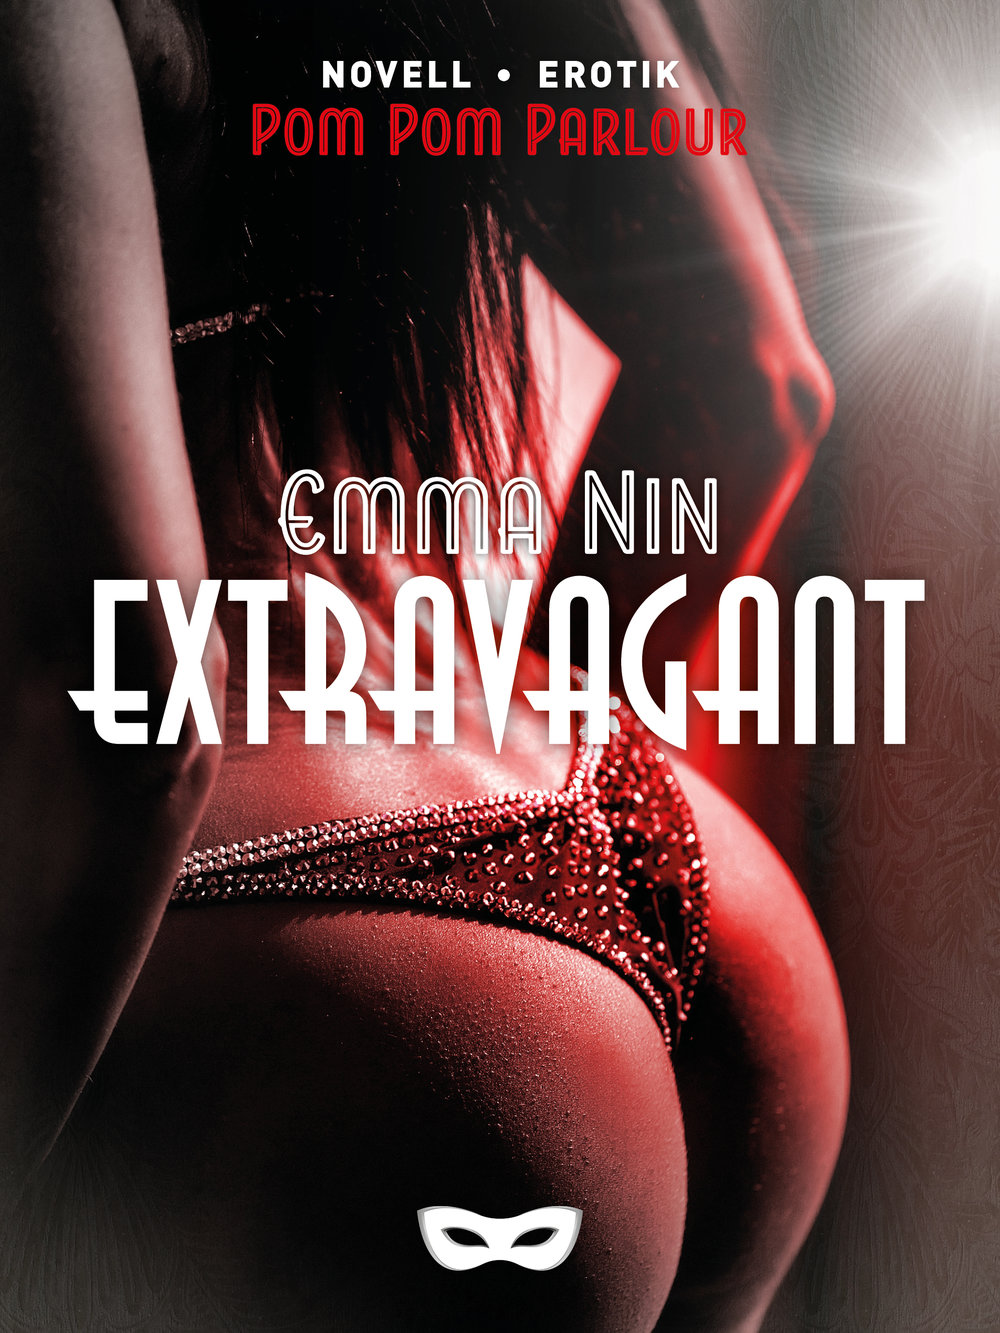 101_cover_Extravagant_L.jpg